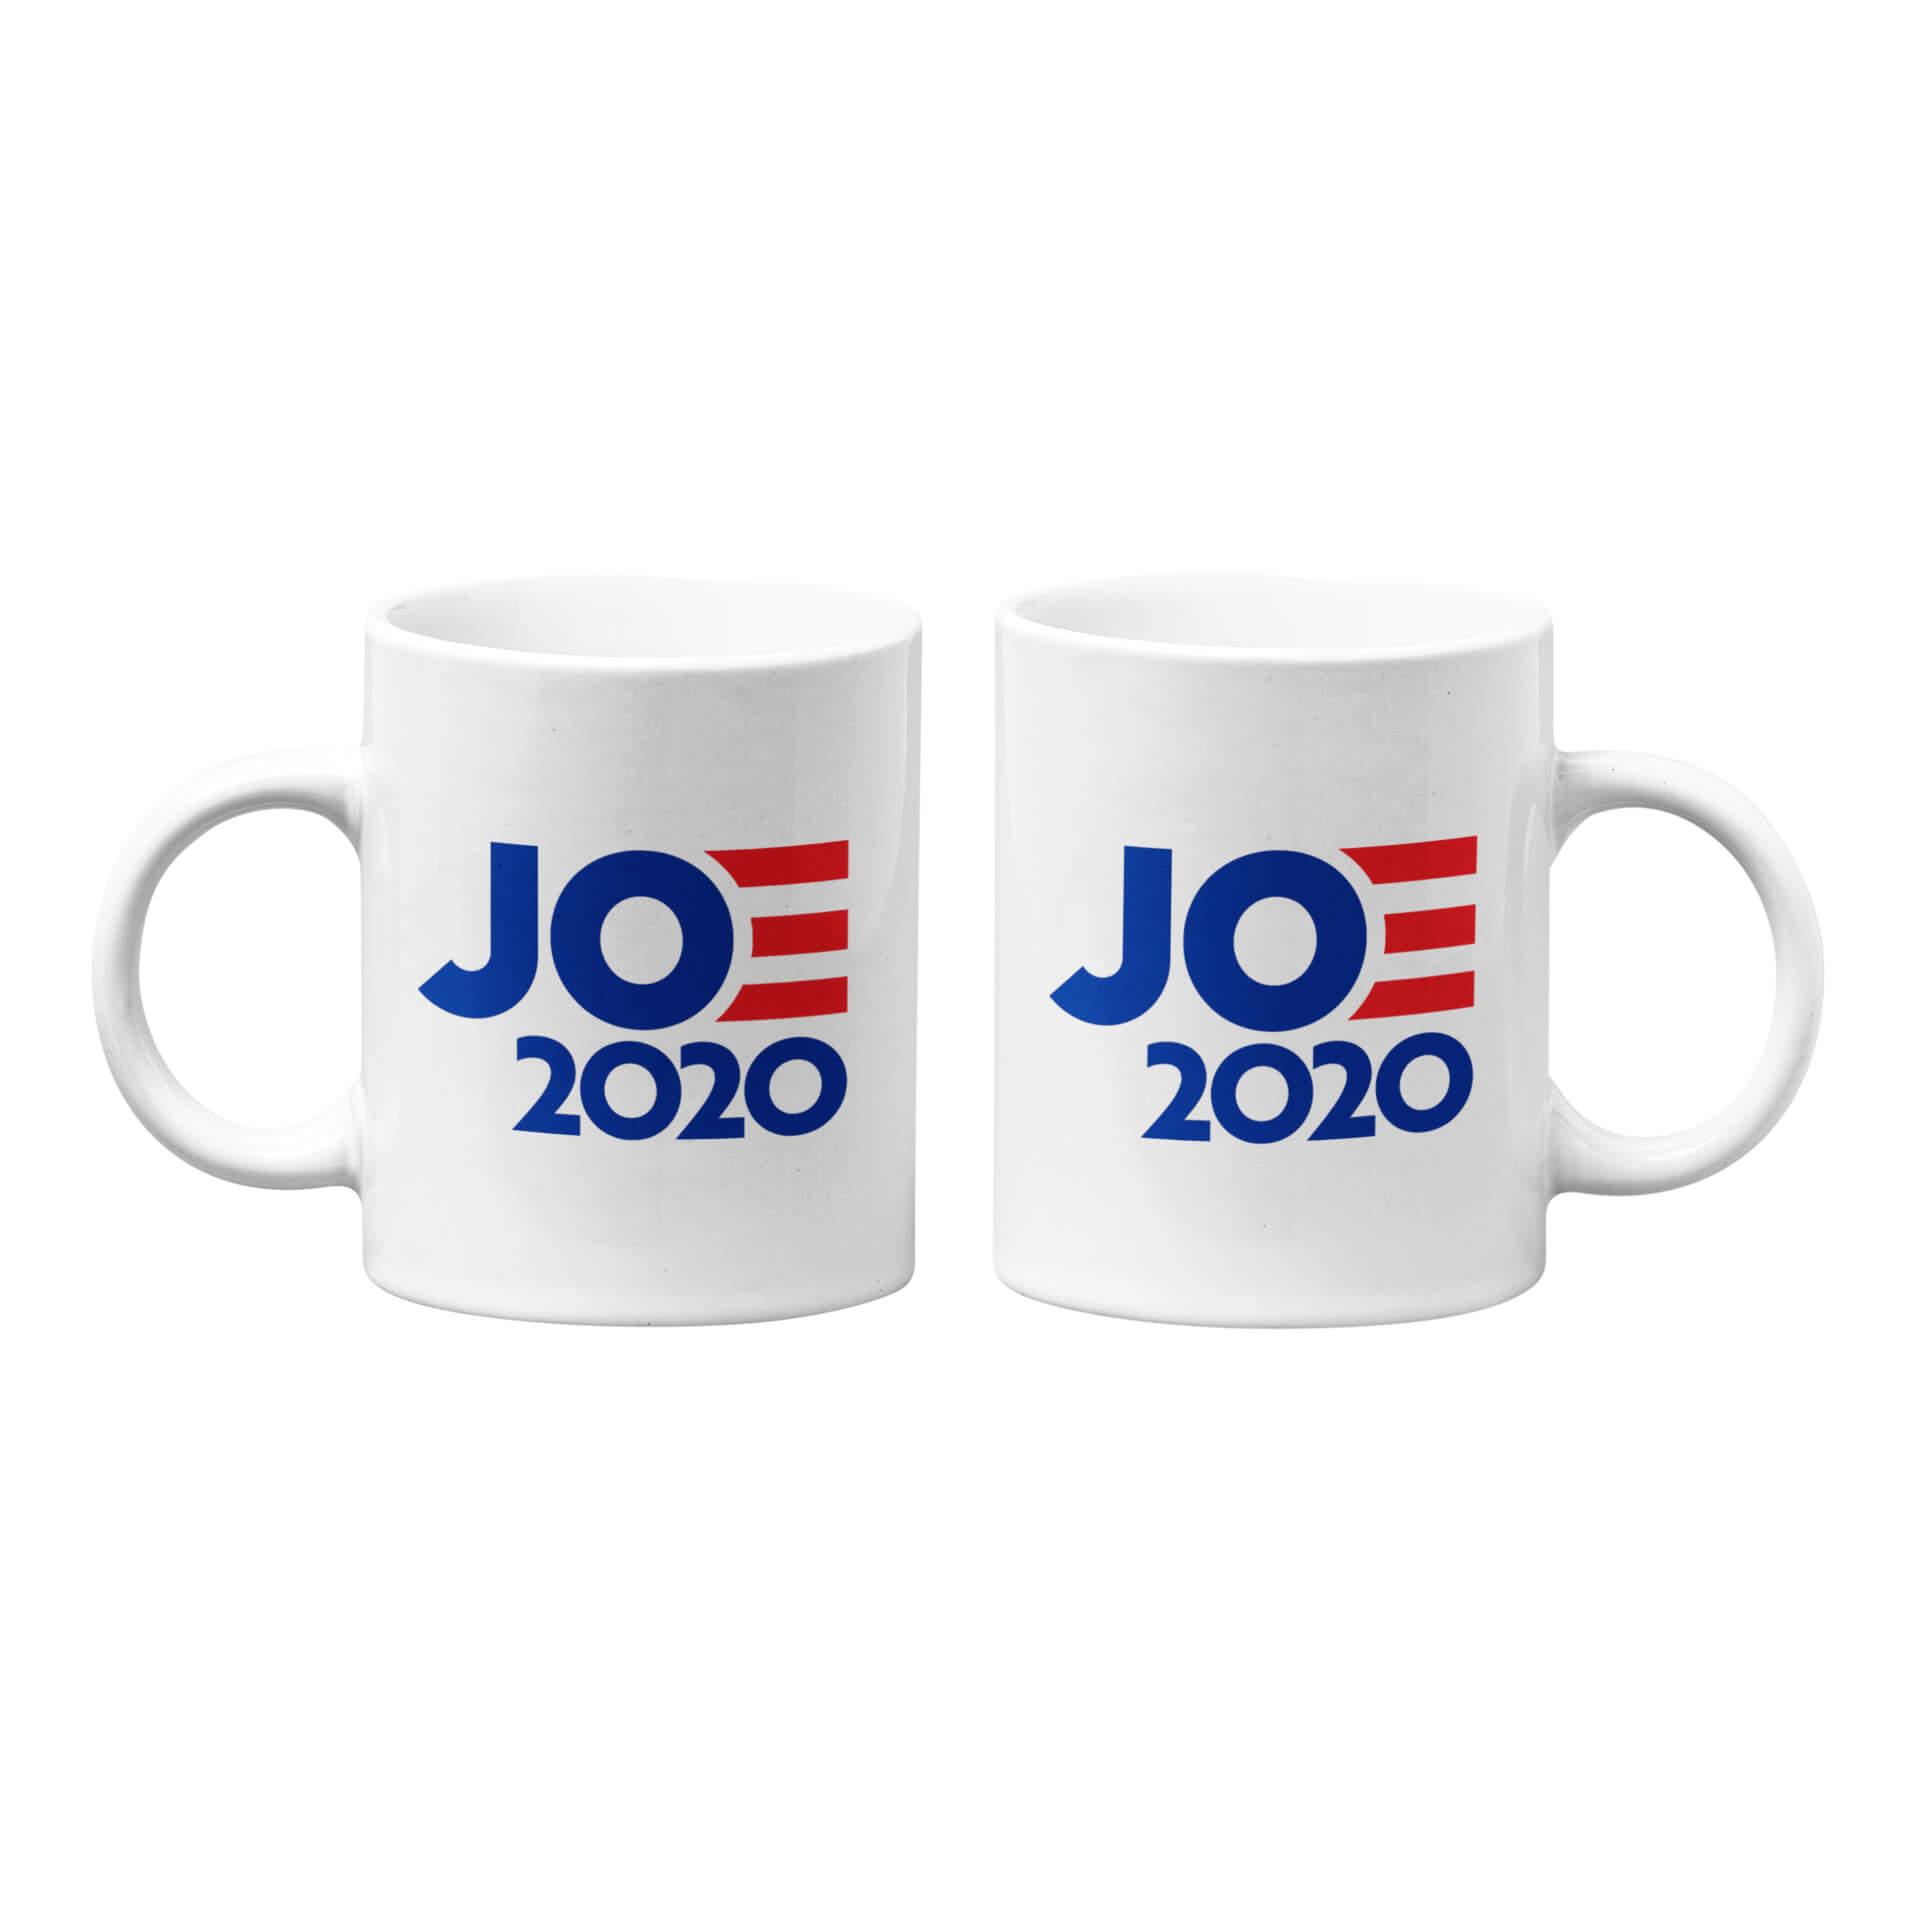 Joe Biden 2020 Mug | Joe Biden Coffee Mug